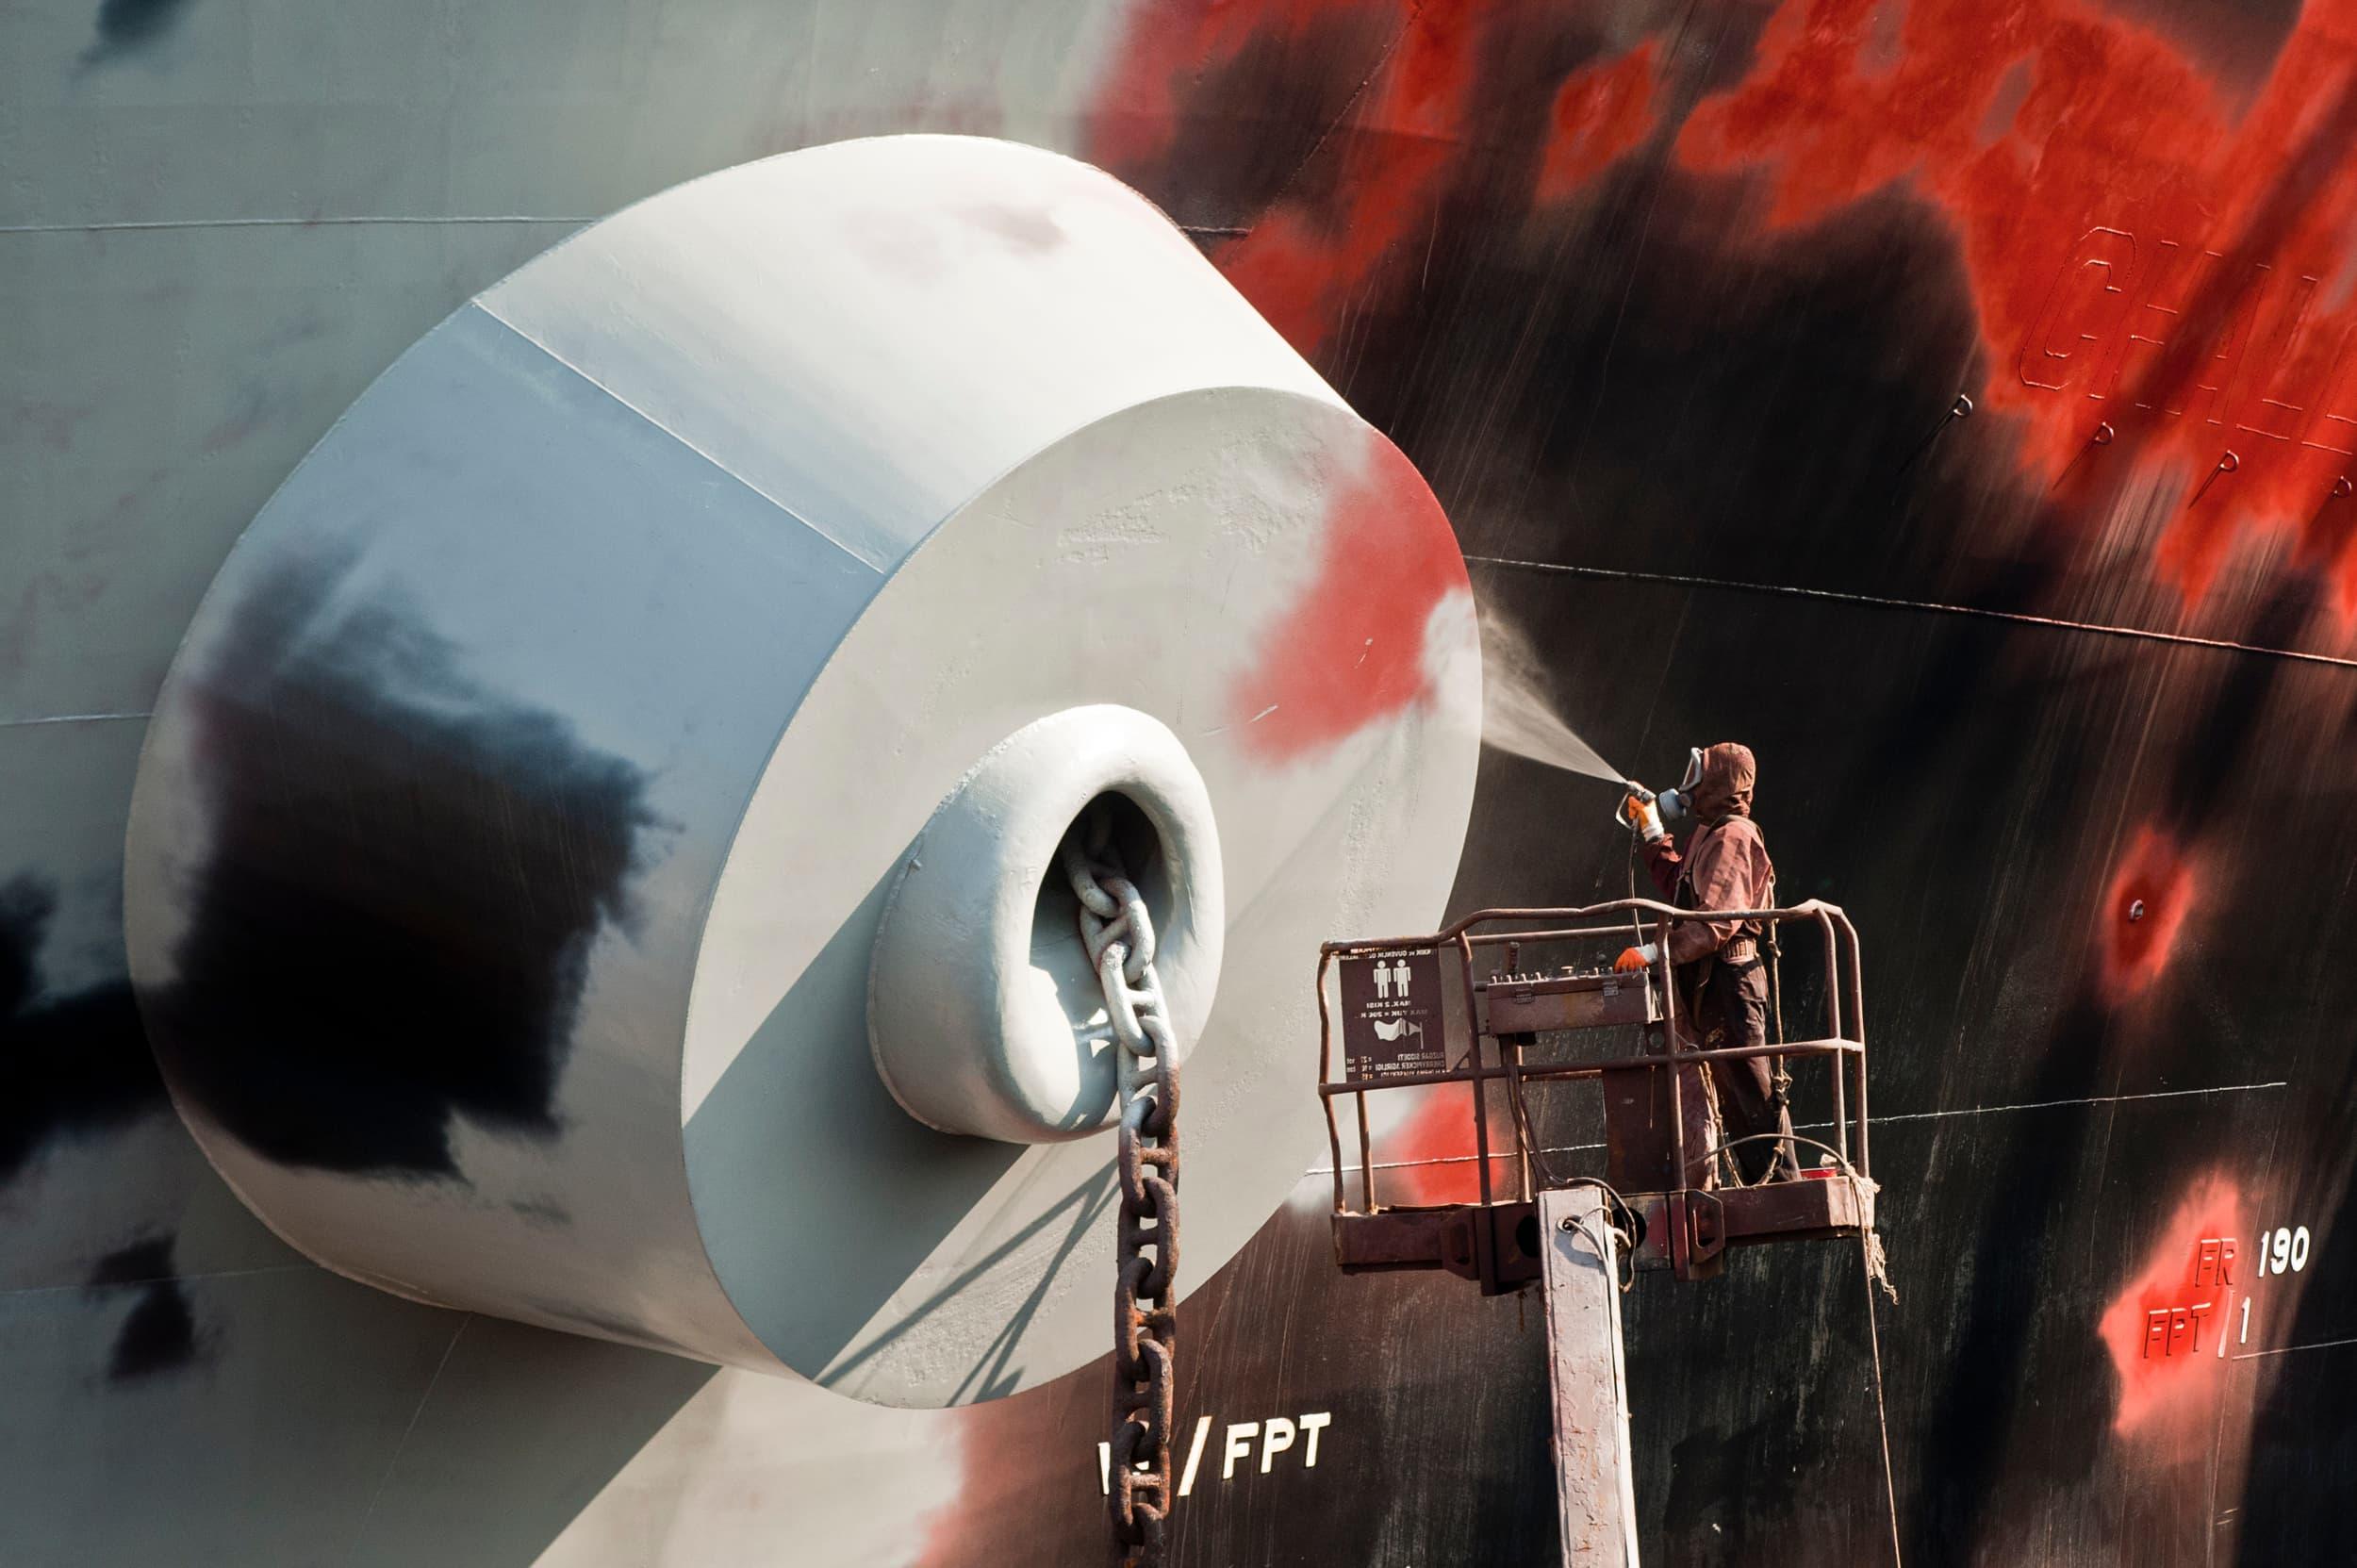 Compliance Training Online Shipyard Chemical Hazards & Toxic Substances course